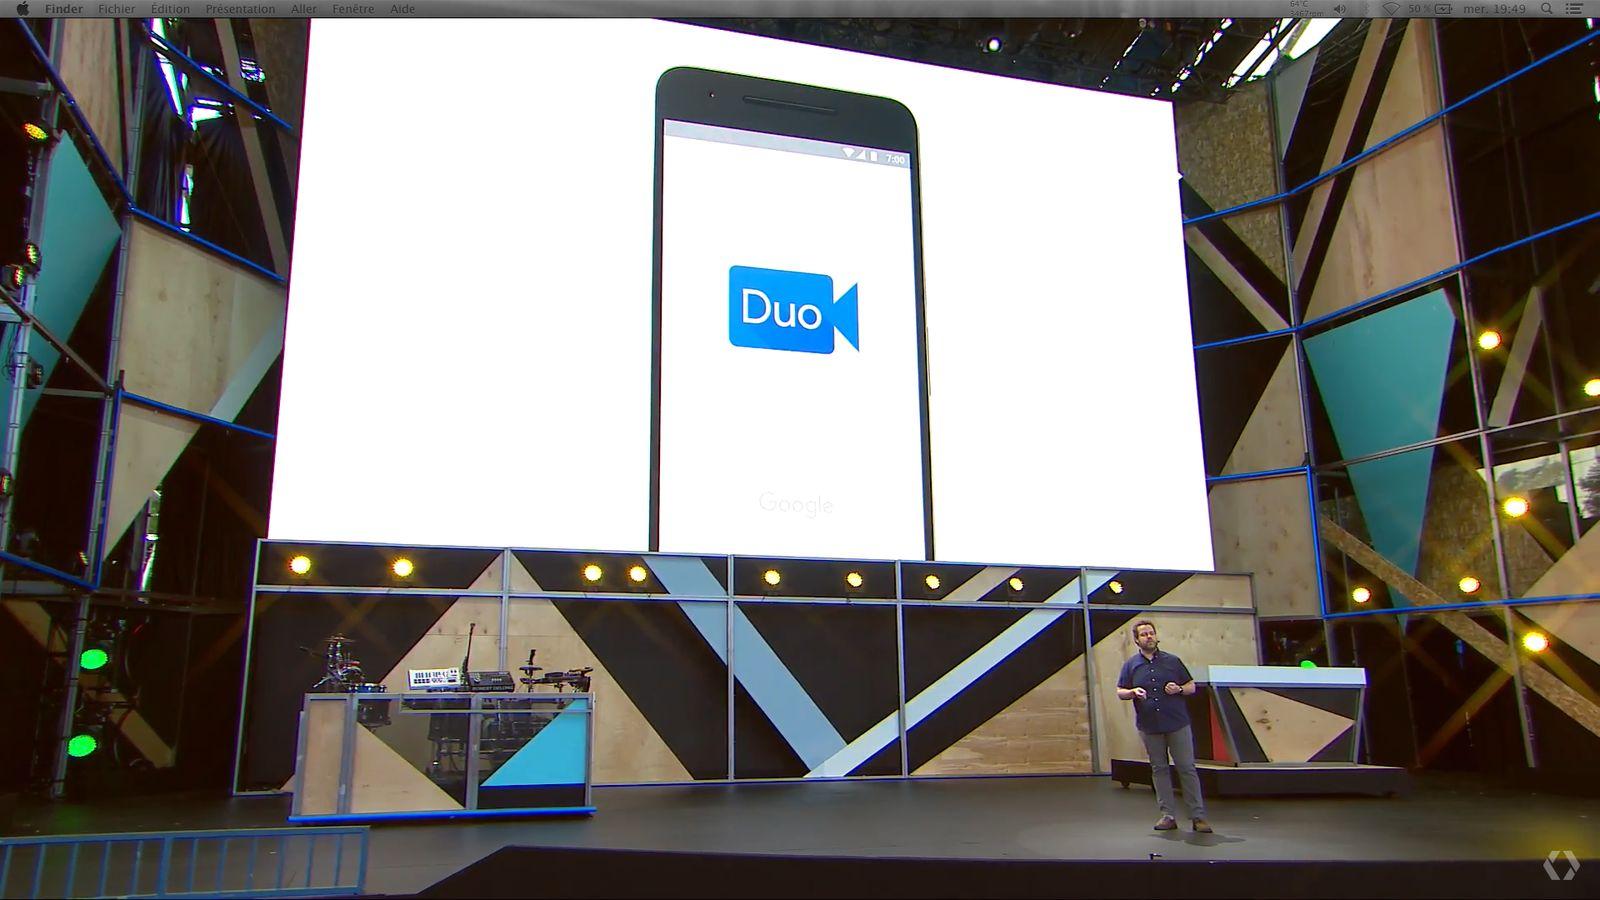 Google Duo proposera bientôt les appels audio